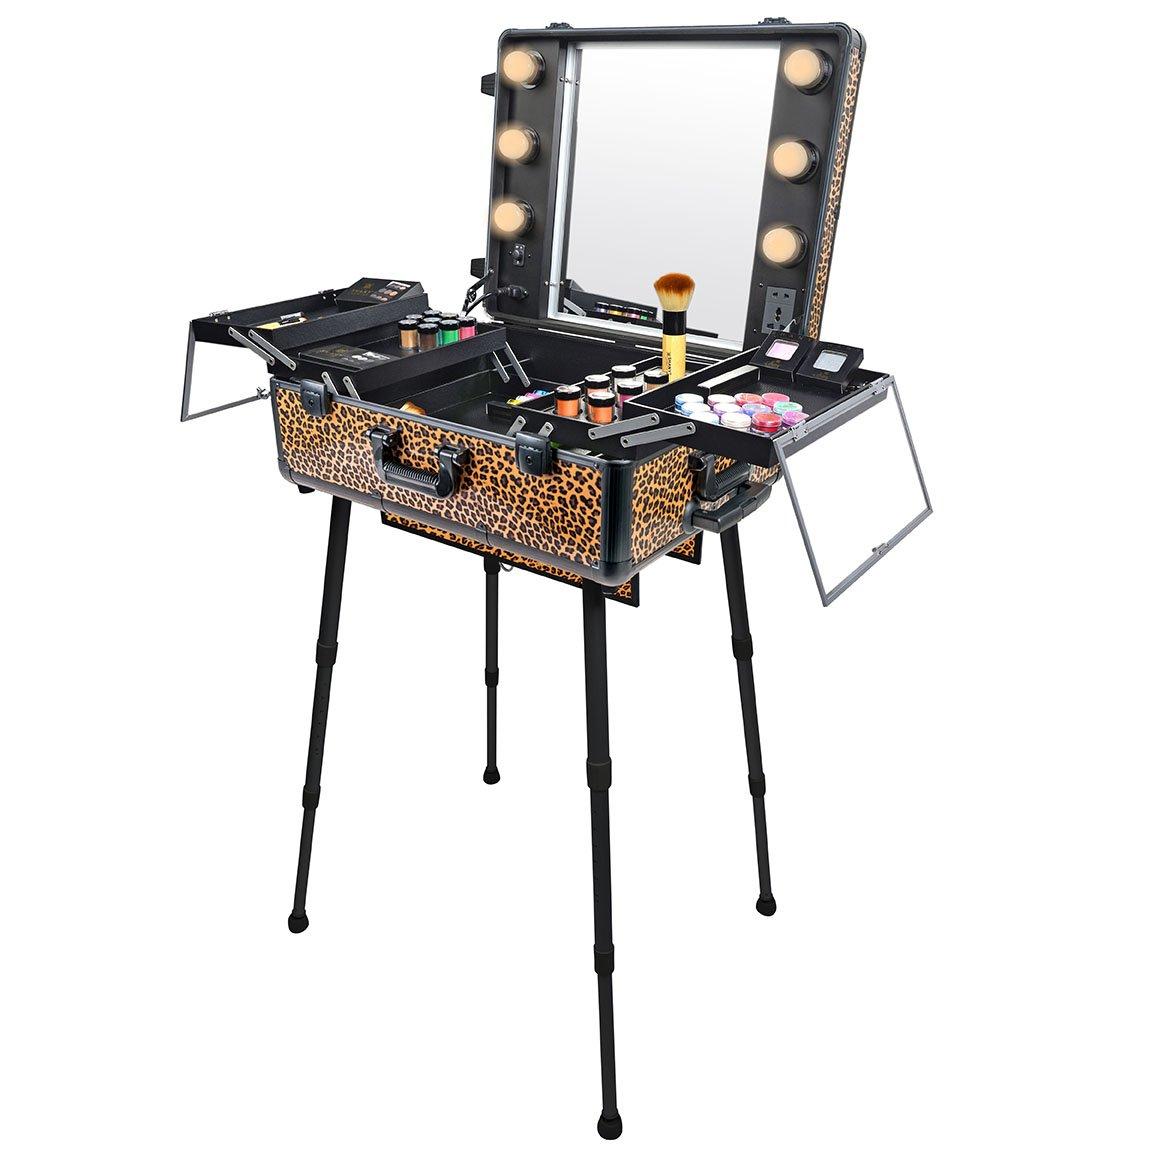 SHANY Studio To Go Makeup Case with Ligh…